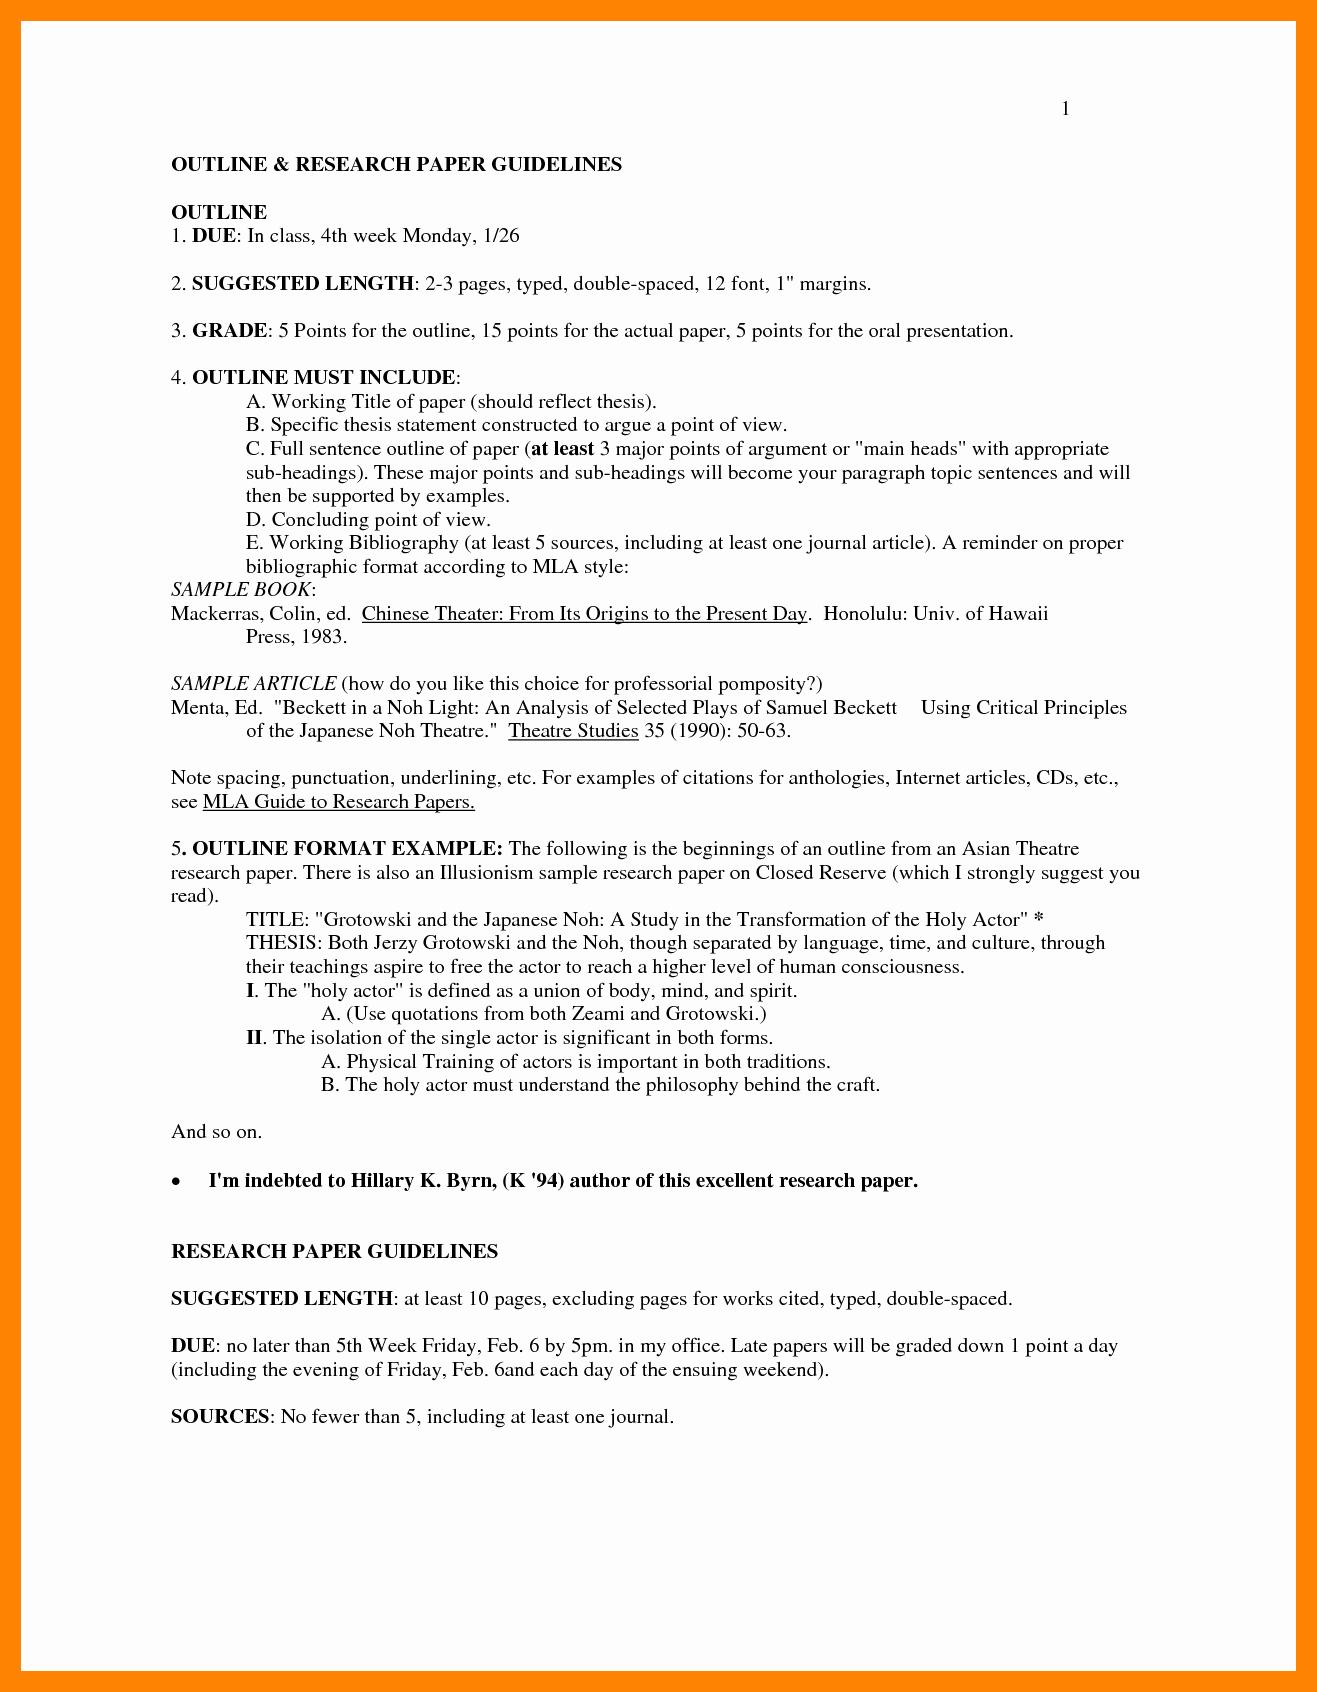 Mla format Research Paper Template Luxury Ideas Best S Proper Mla format Outline Mla